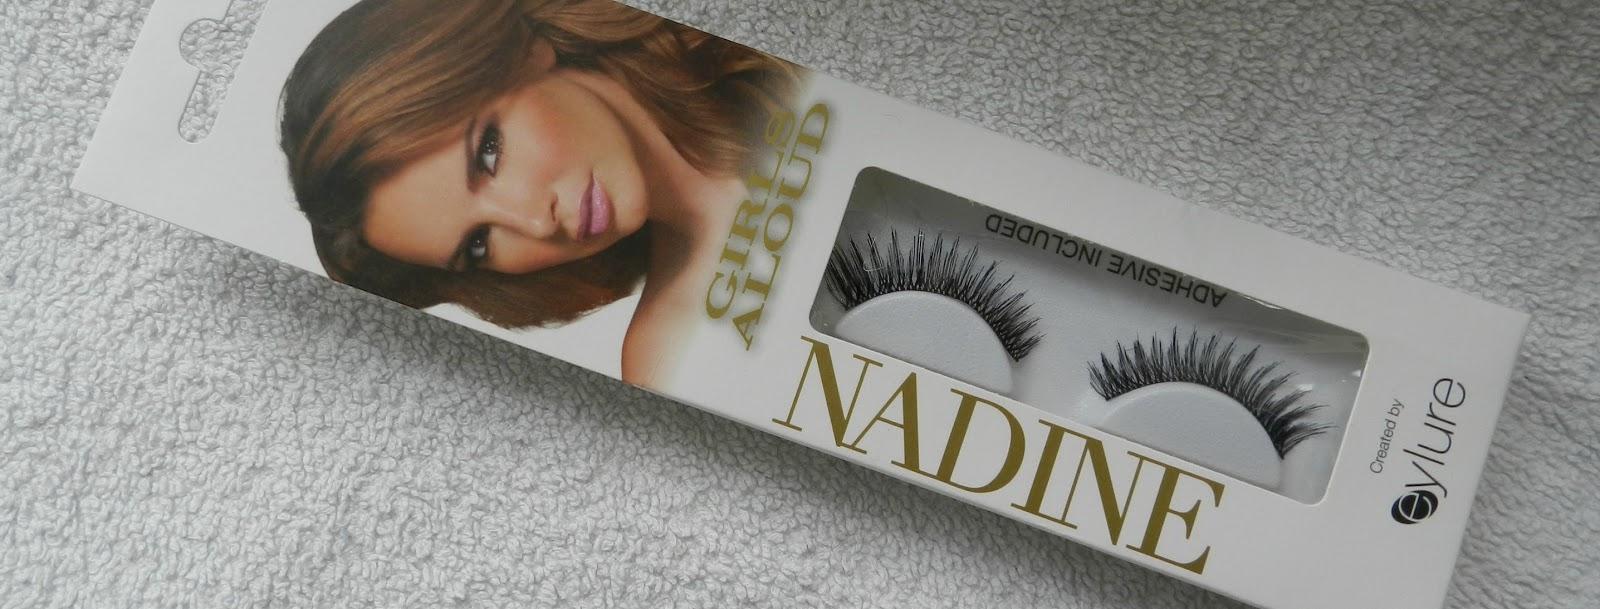 Vintage Allure Nadine Coyle Eylure Lashes